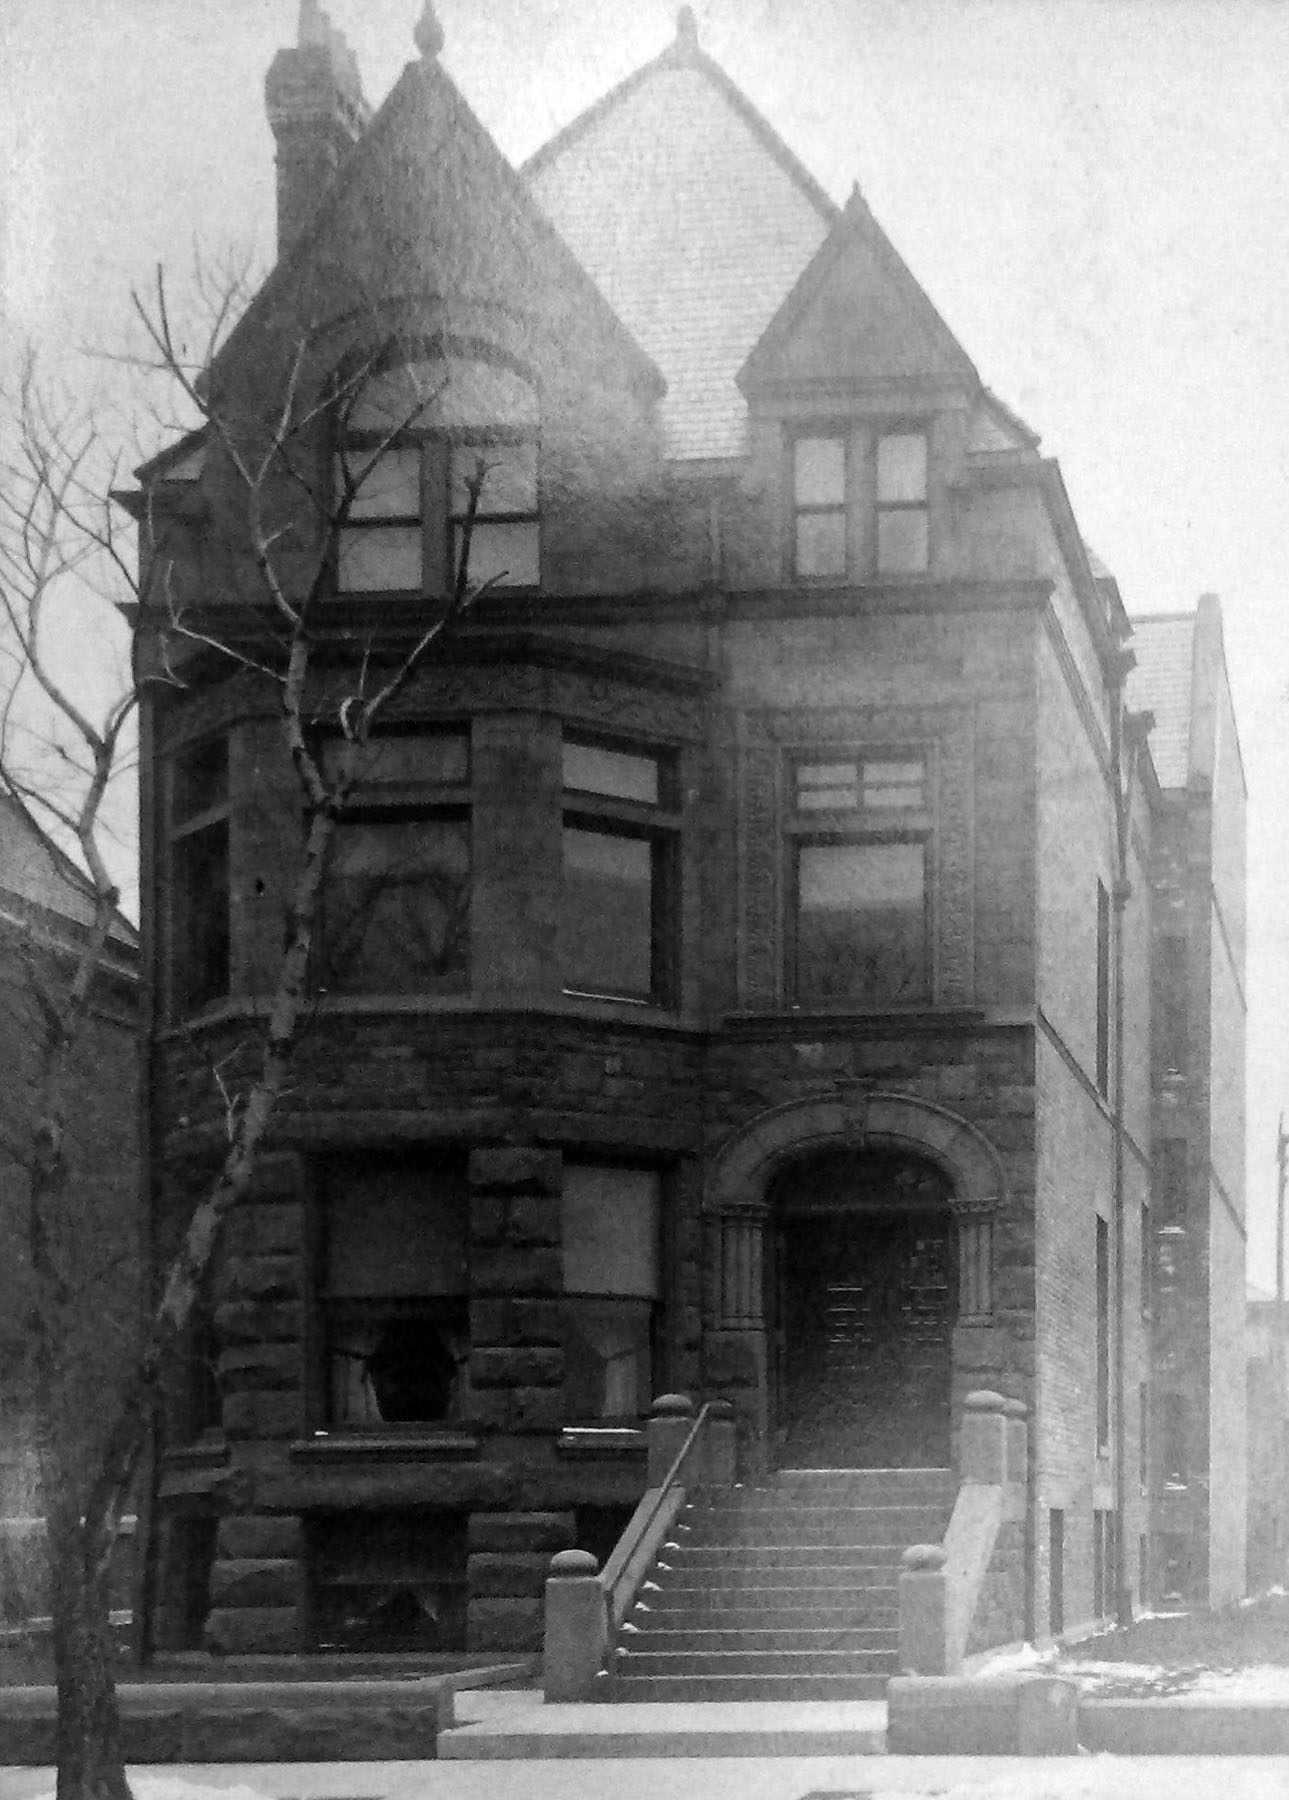 Shaw house, 2124 S. Calumet Avenue